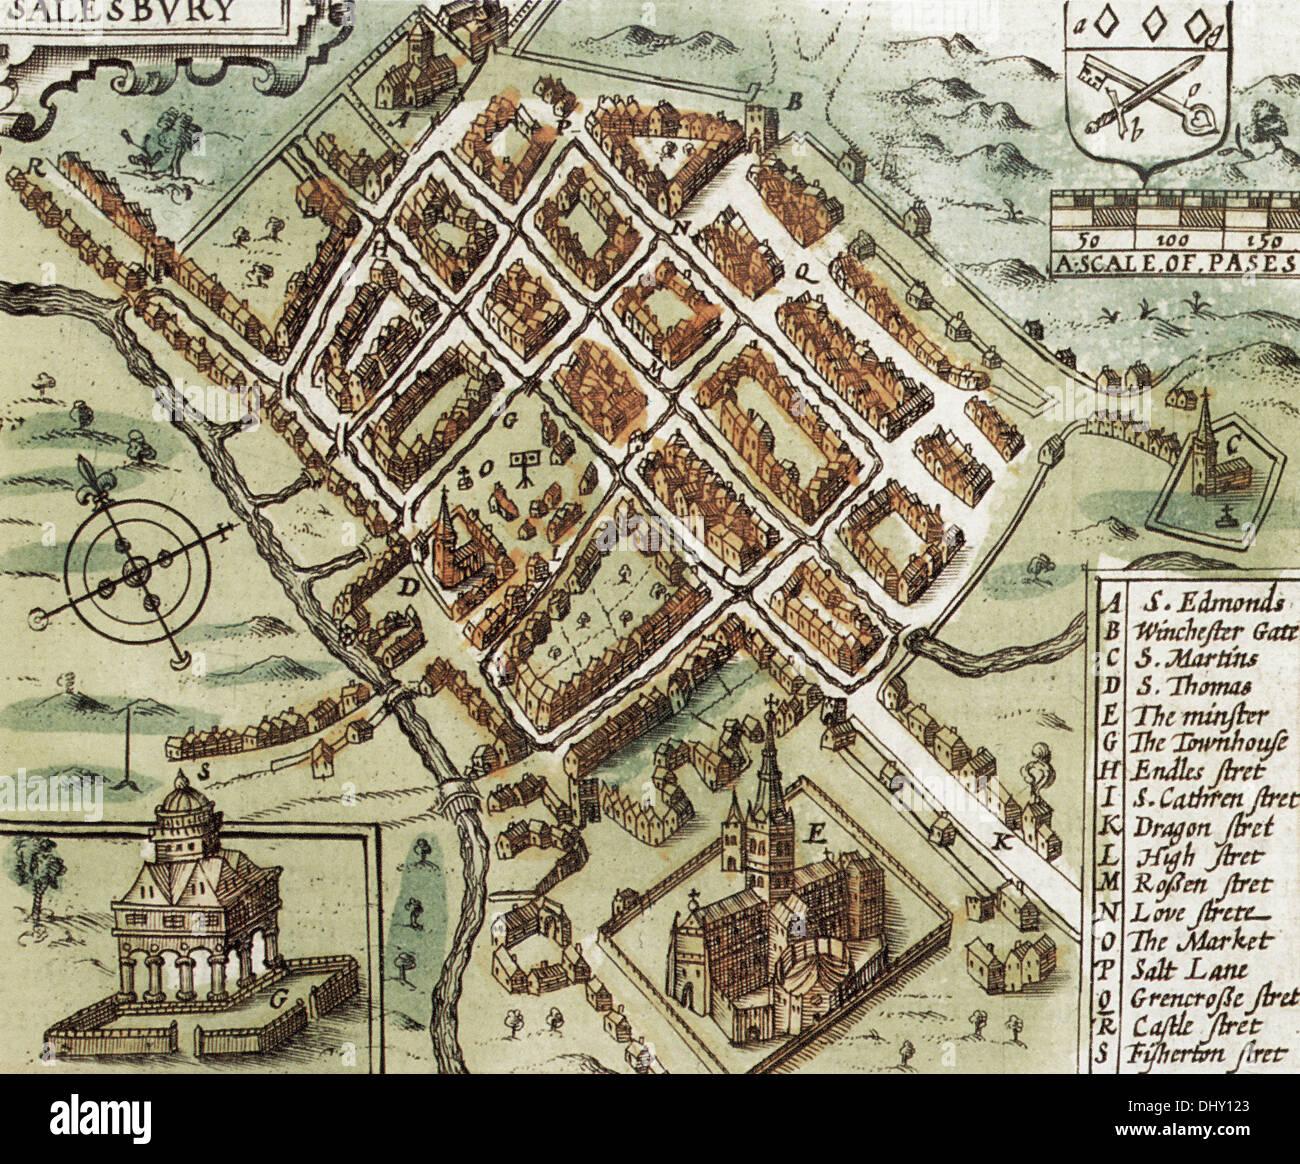 Old Map Of Salisbury England By John Speed 1611 Stock Photo